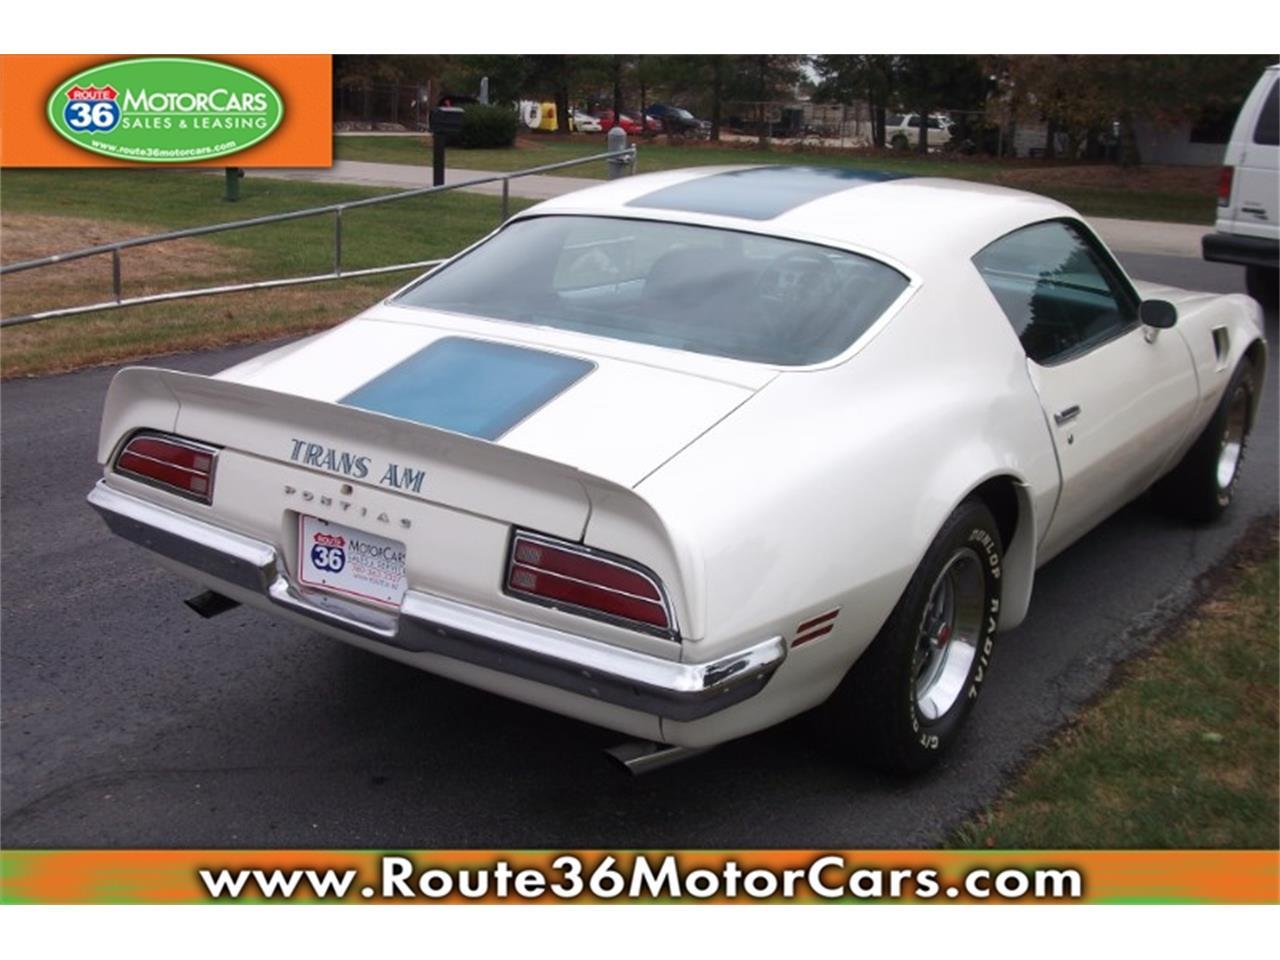 Large Picture of 1972 Pontiac Firebird located in Dublin Ohio - $54,975.00 - IKH6